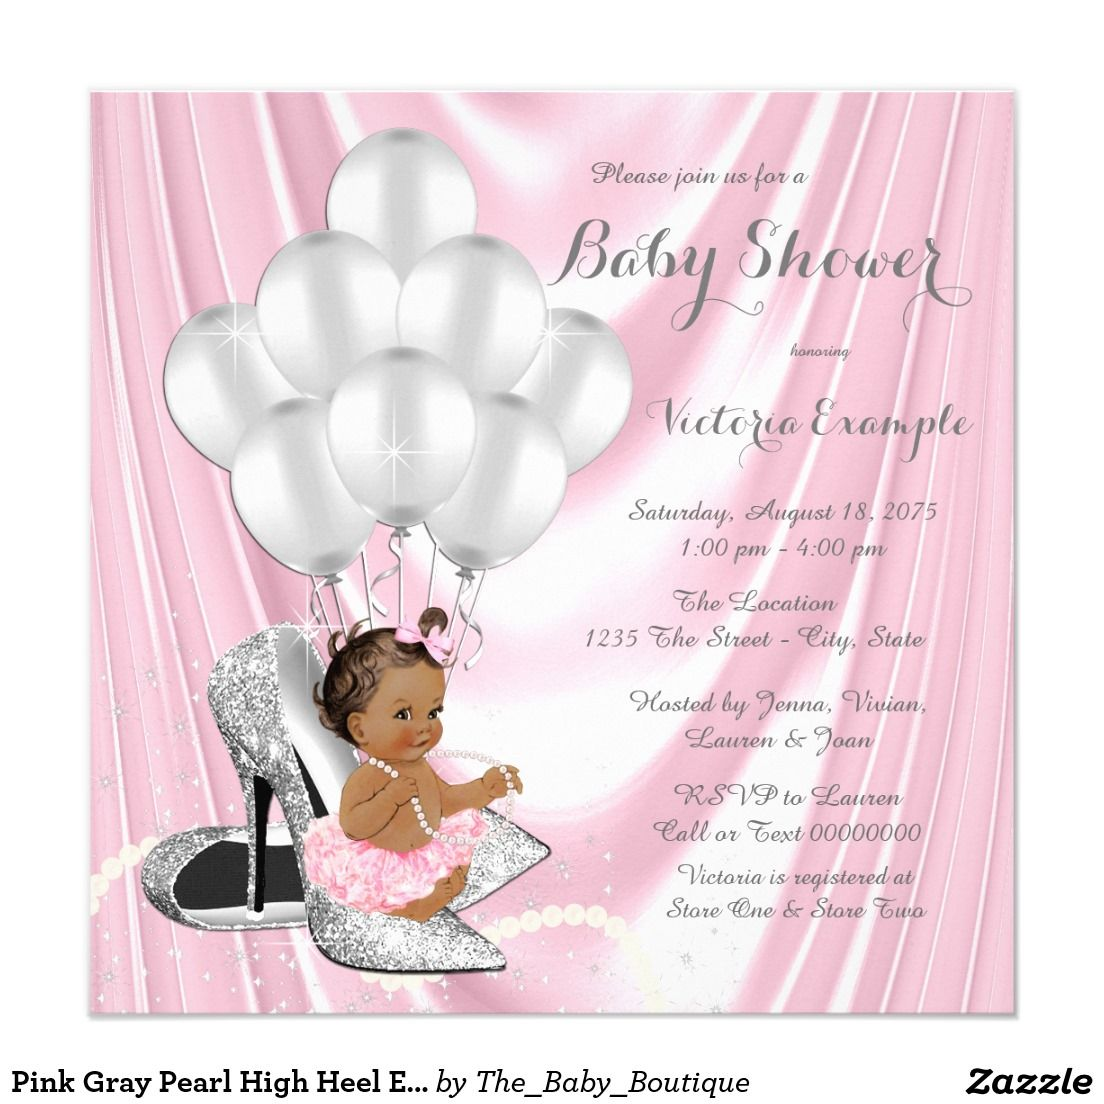 Pink Gray Pearl High Heel Ethnic Baby Shower Invitation | Ethnic ...